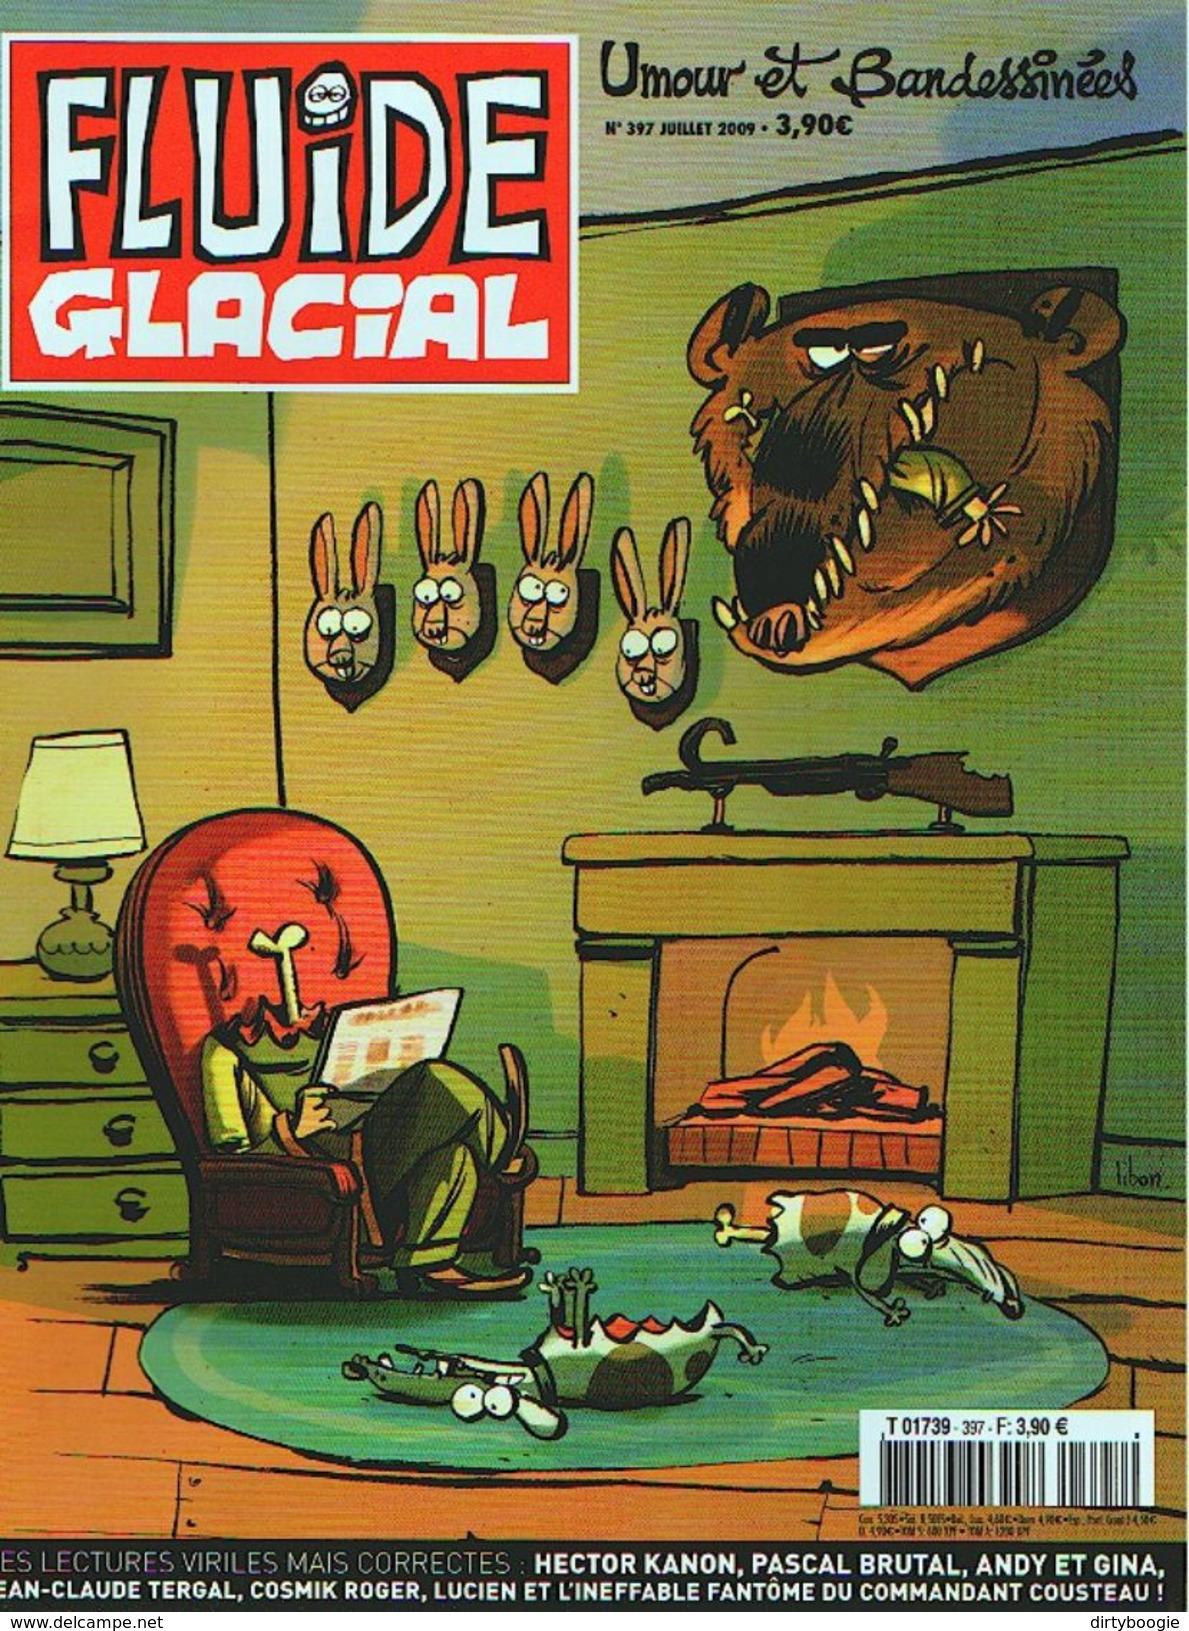 FLUIDE GLACIAL N° 397 - Juillet 2009 - CHAUZY - Pascal BRUTAL - ANDY & GINA - Jean-Claude TERGAL - COSMIK ROGER - Fluide Glacial